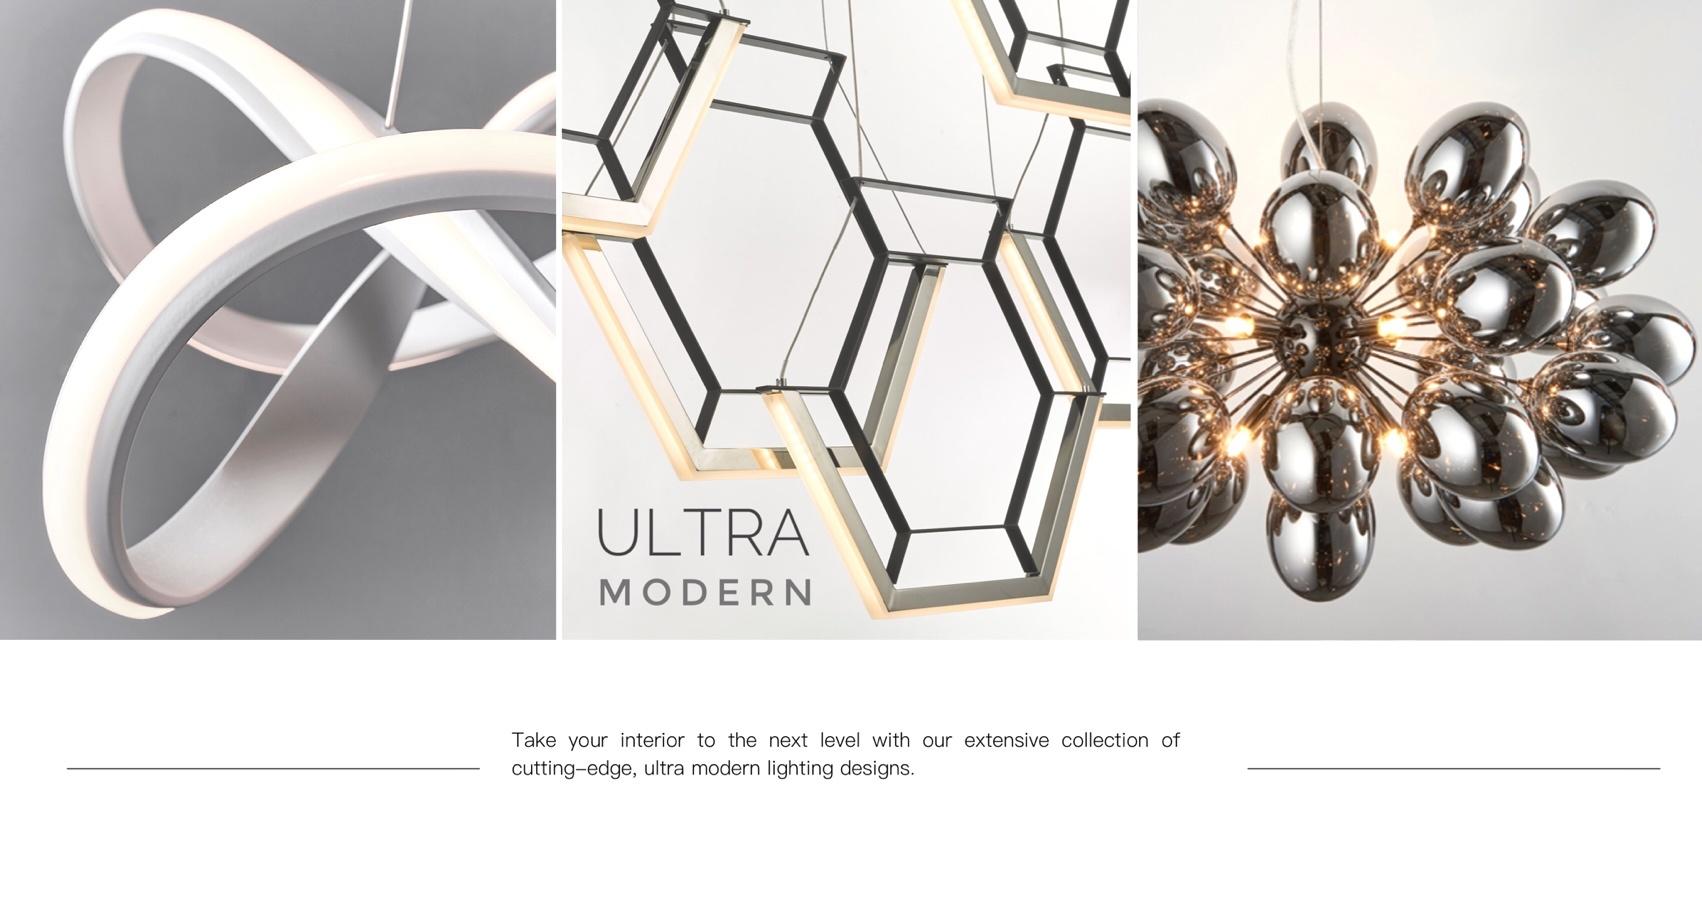 Ultra Modern Lighting